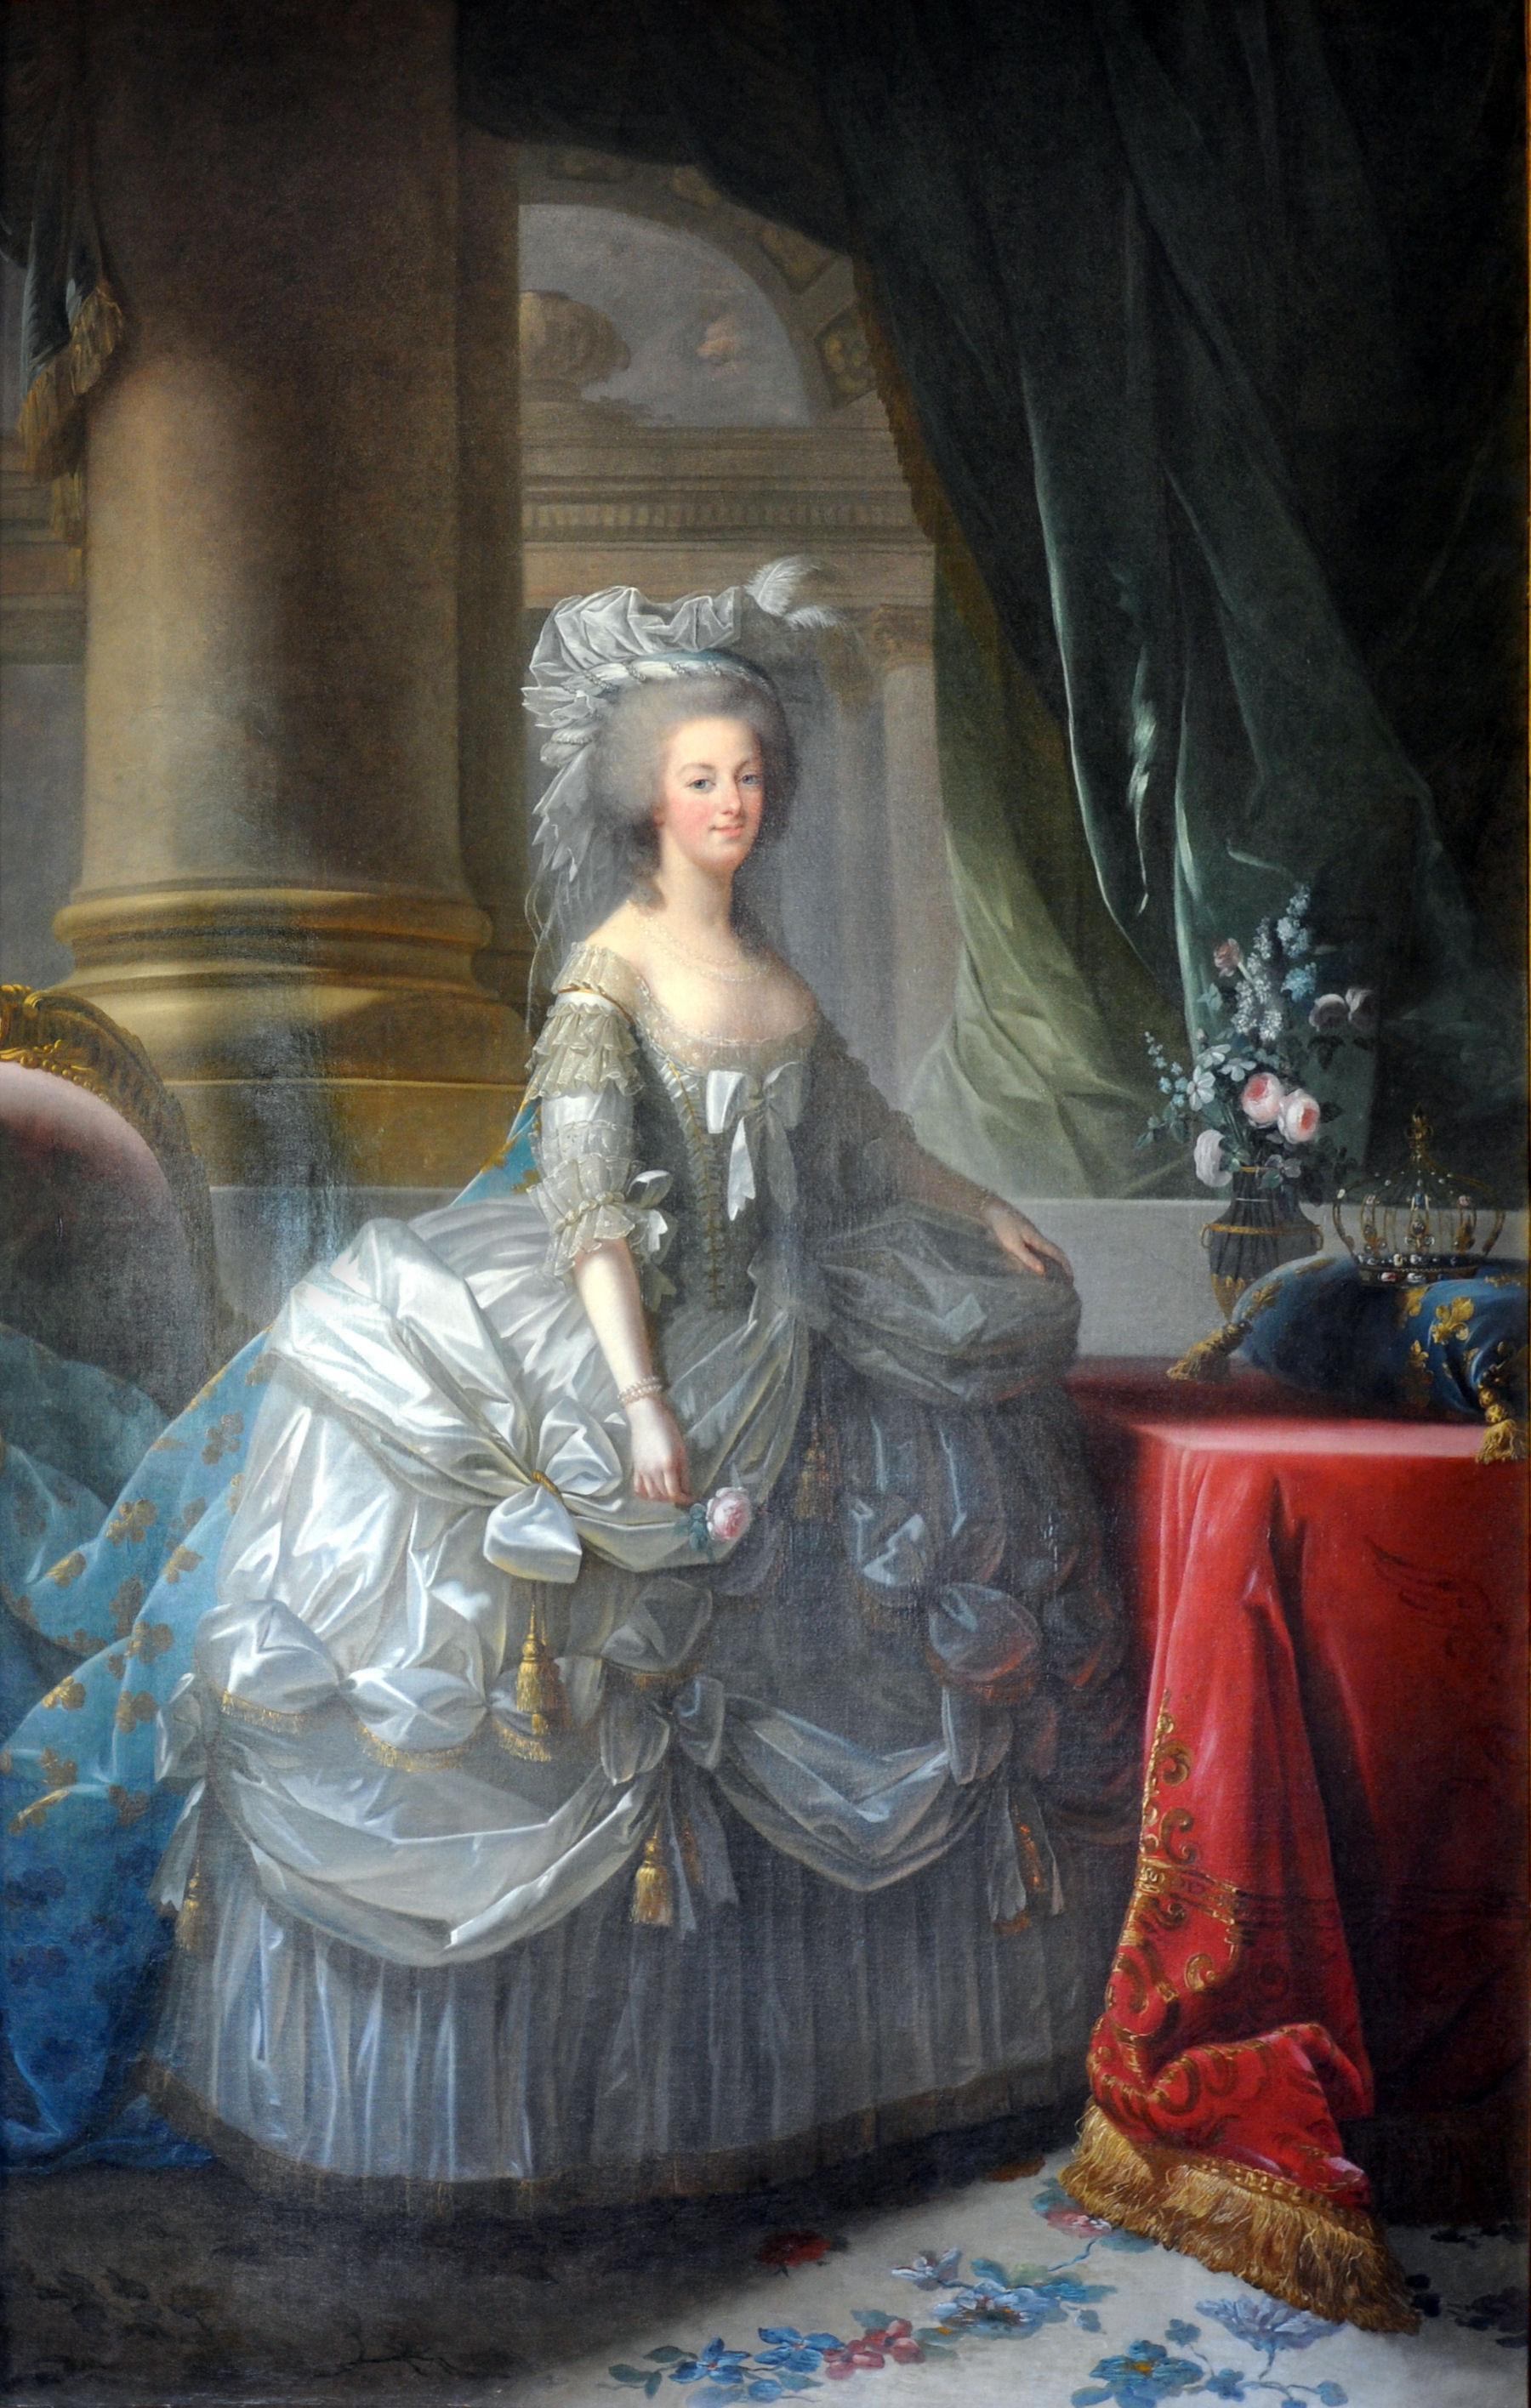 Marie Antoinette, 1779, by Élisabeth Vigée-Lebrun.